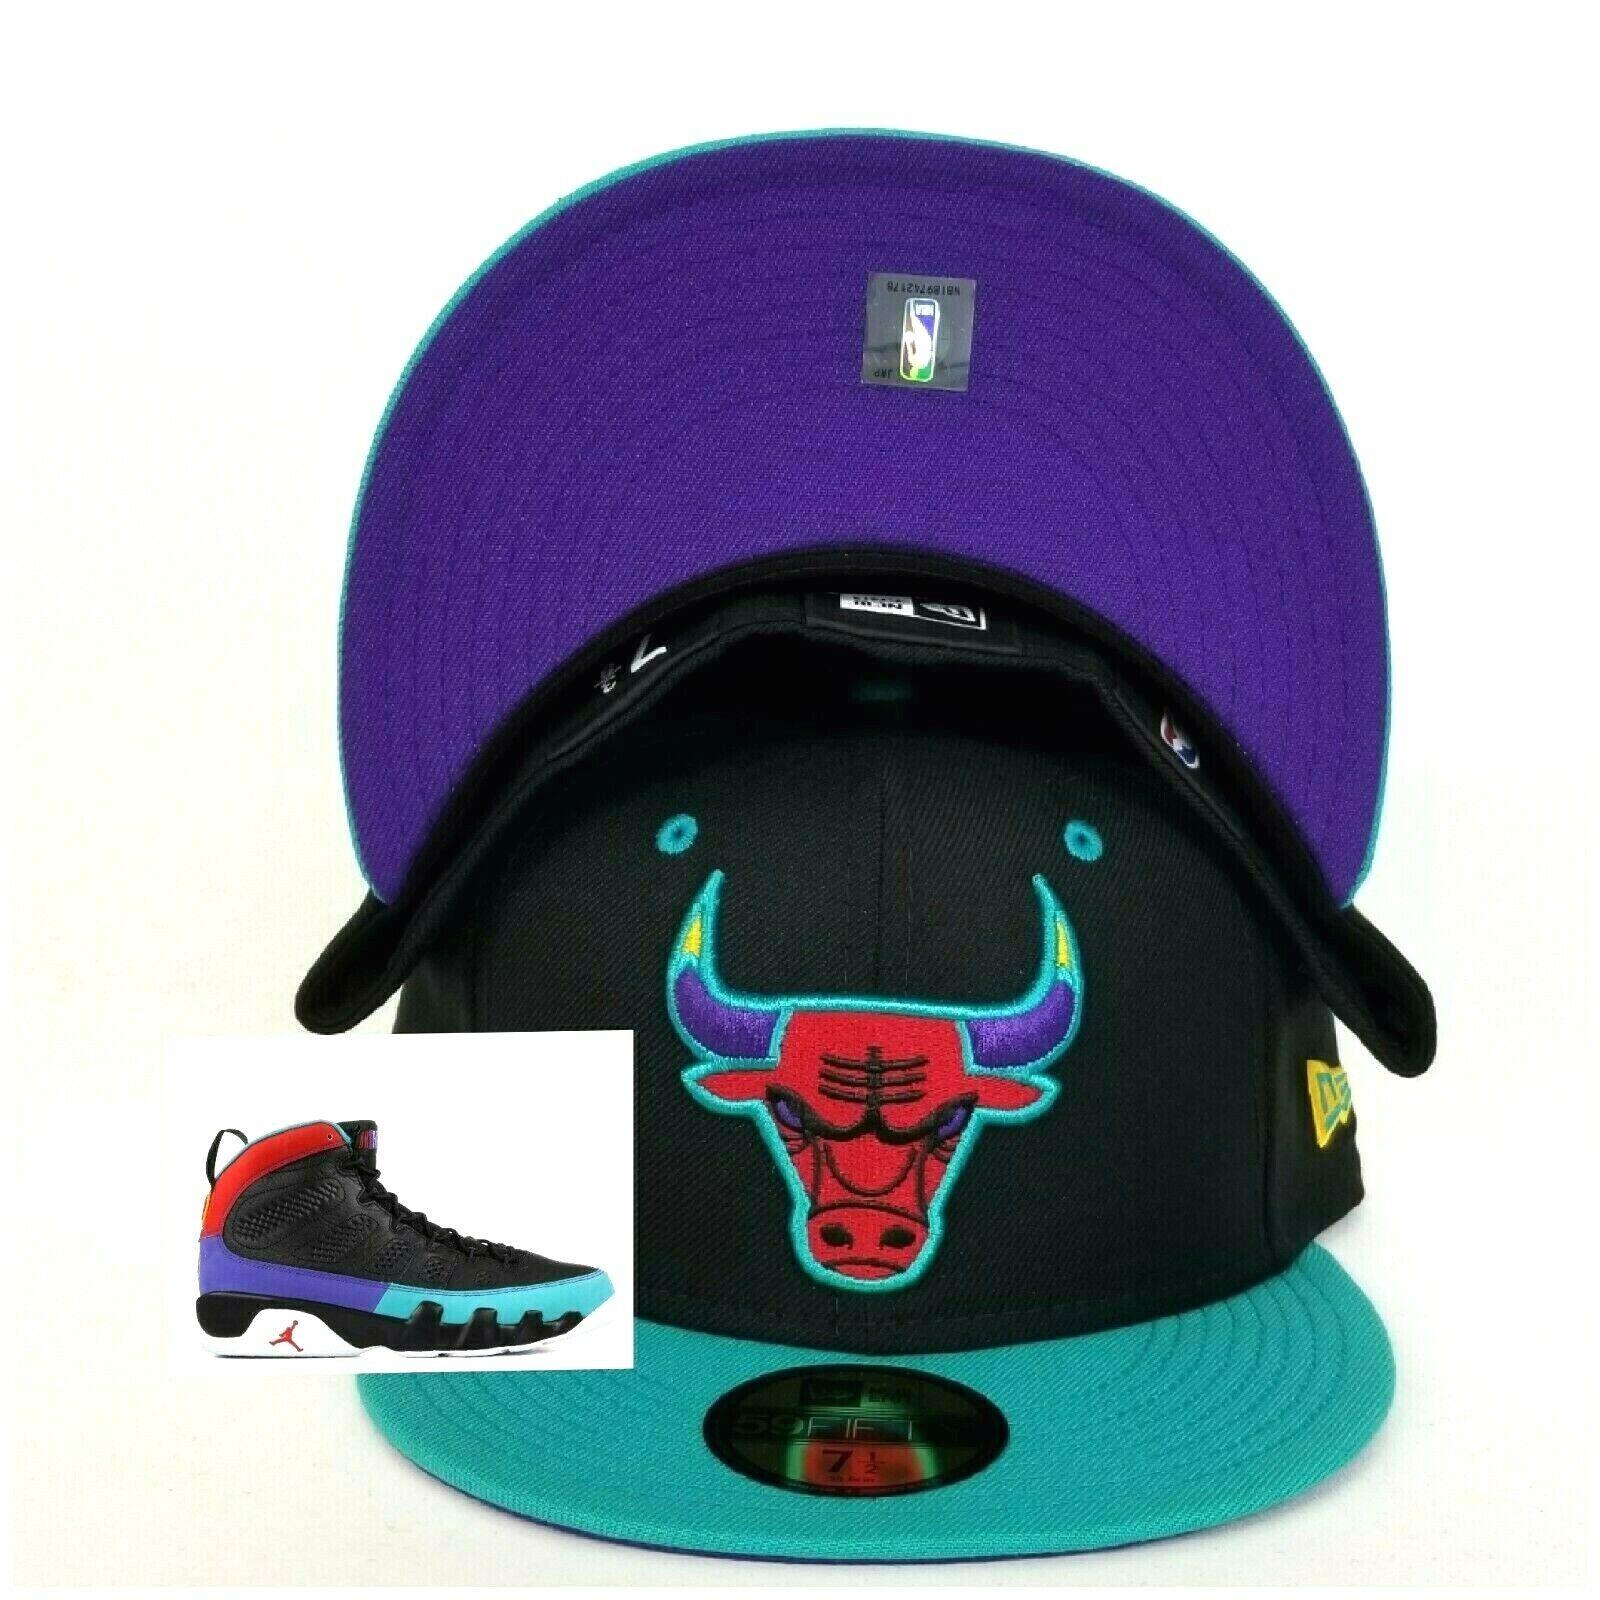 7486739d623 Chicago Bulls New Era Fitted hat Jordan 9 Dream it Do it   eBay